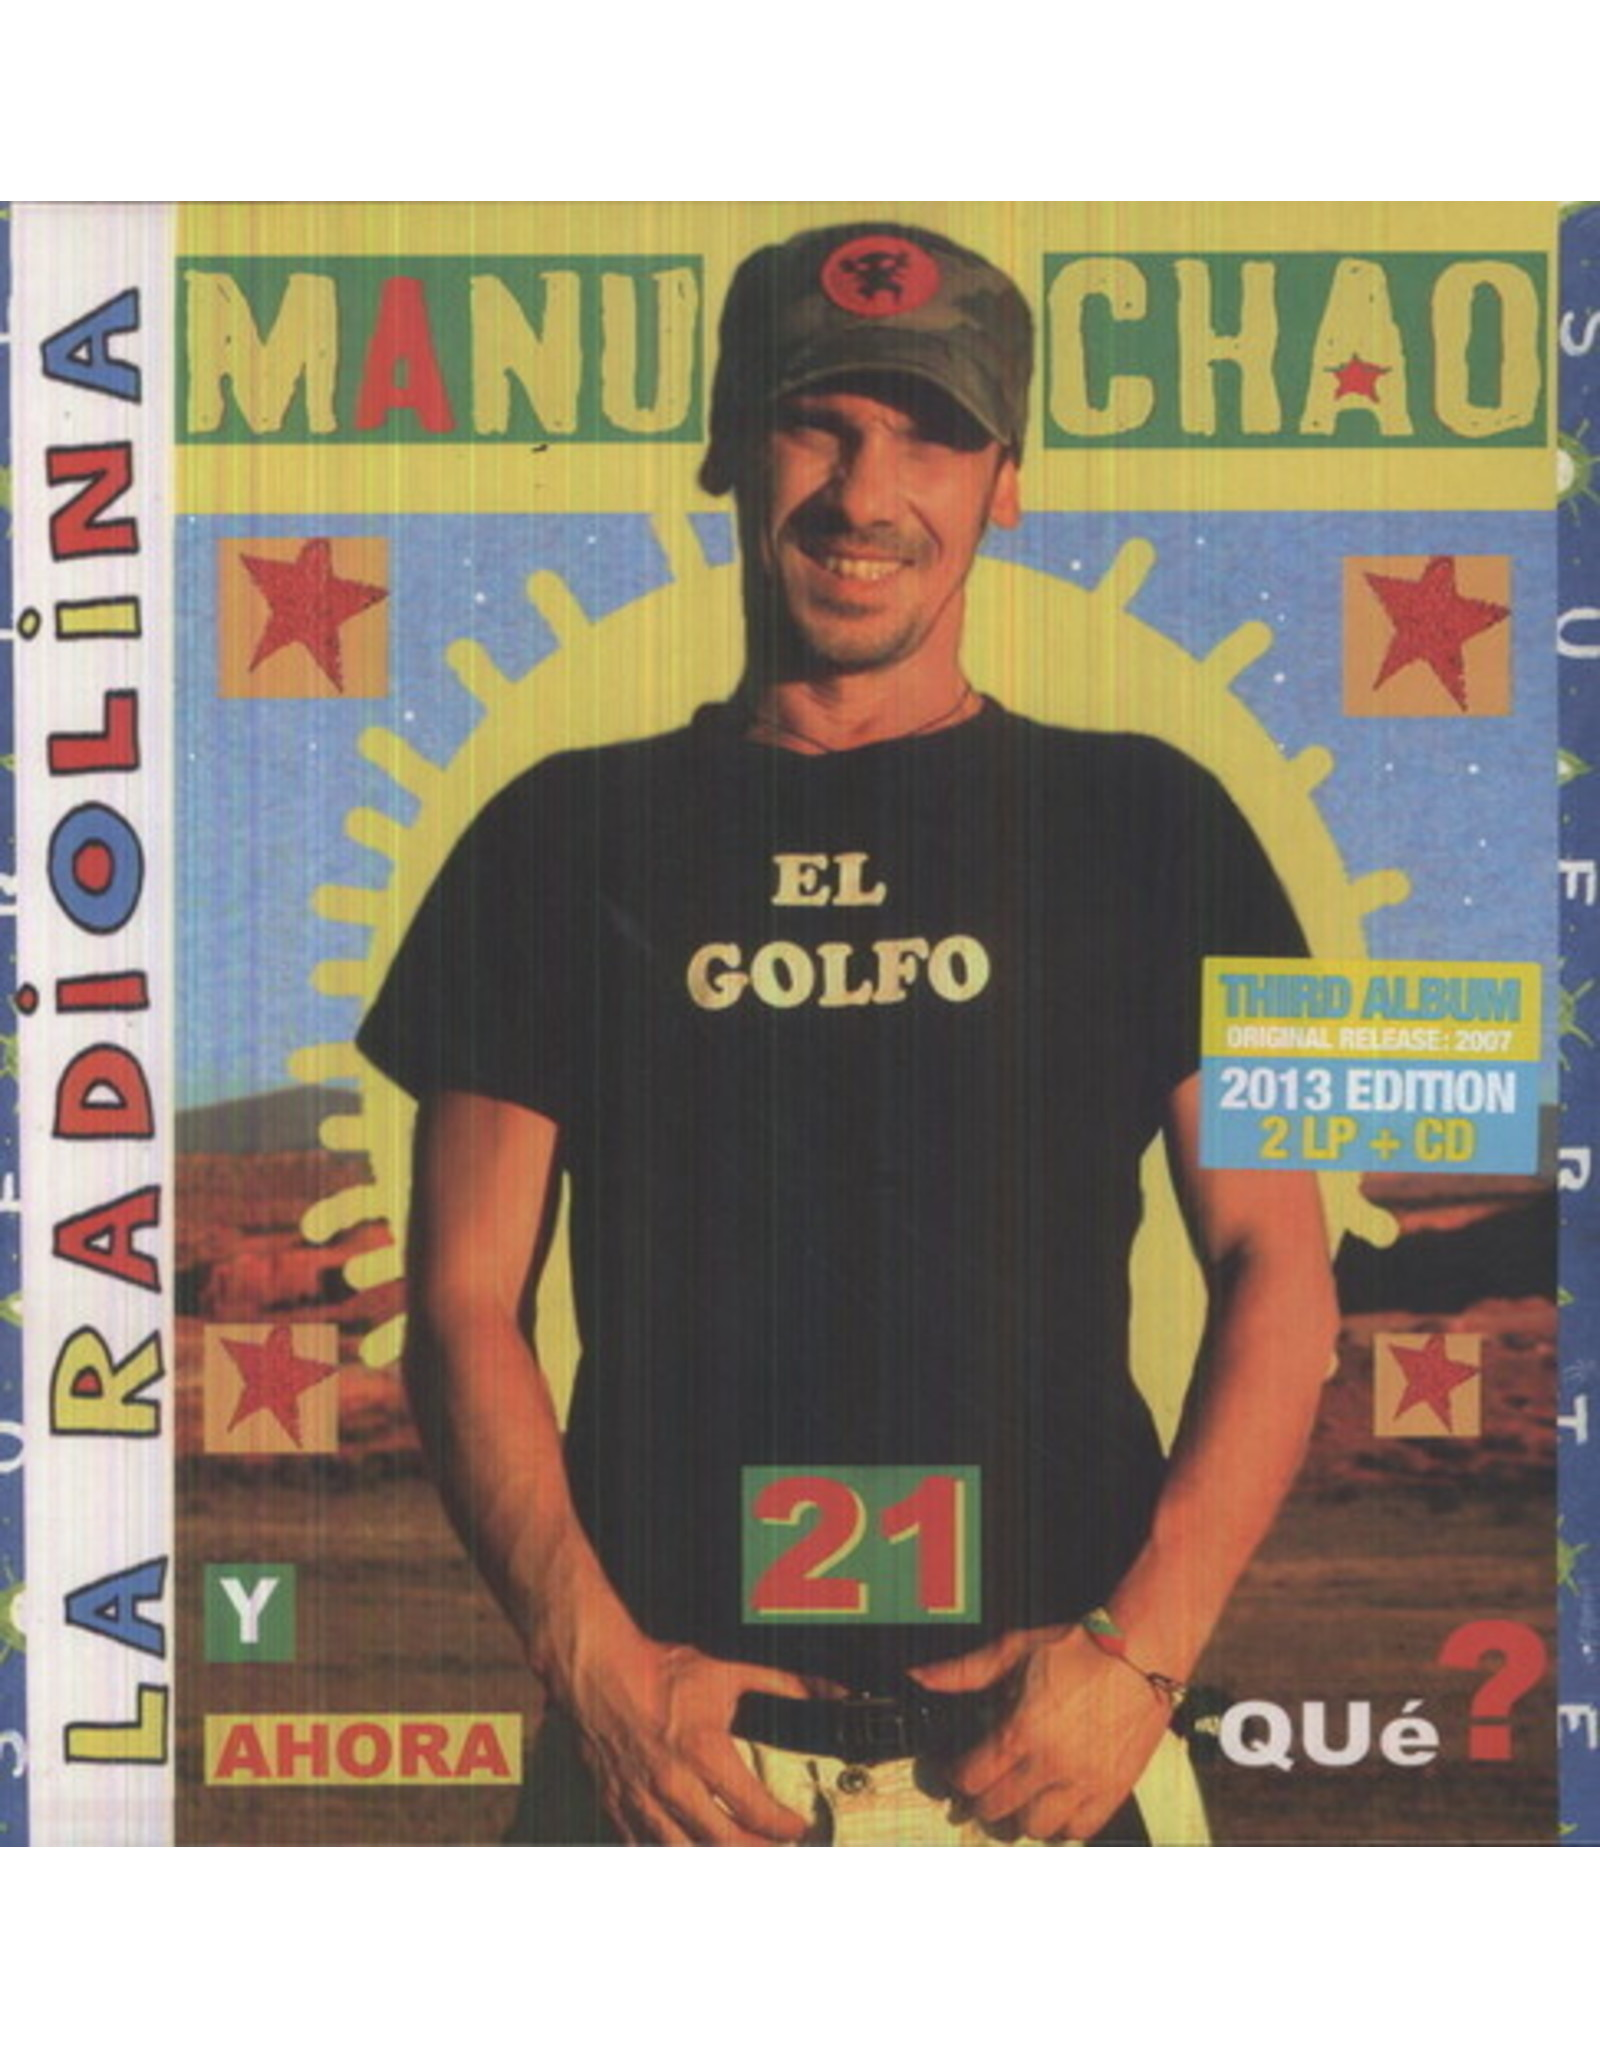 New Vinyl Manu Chao - La Radiolina 2LP+CD